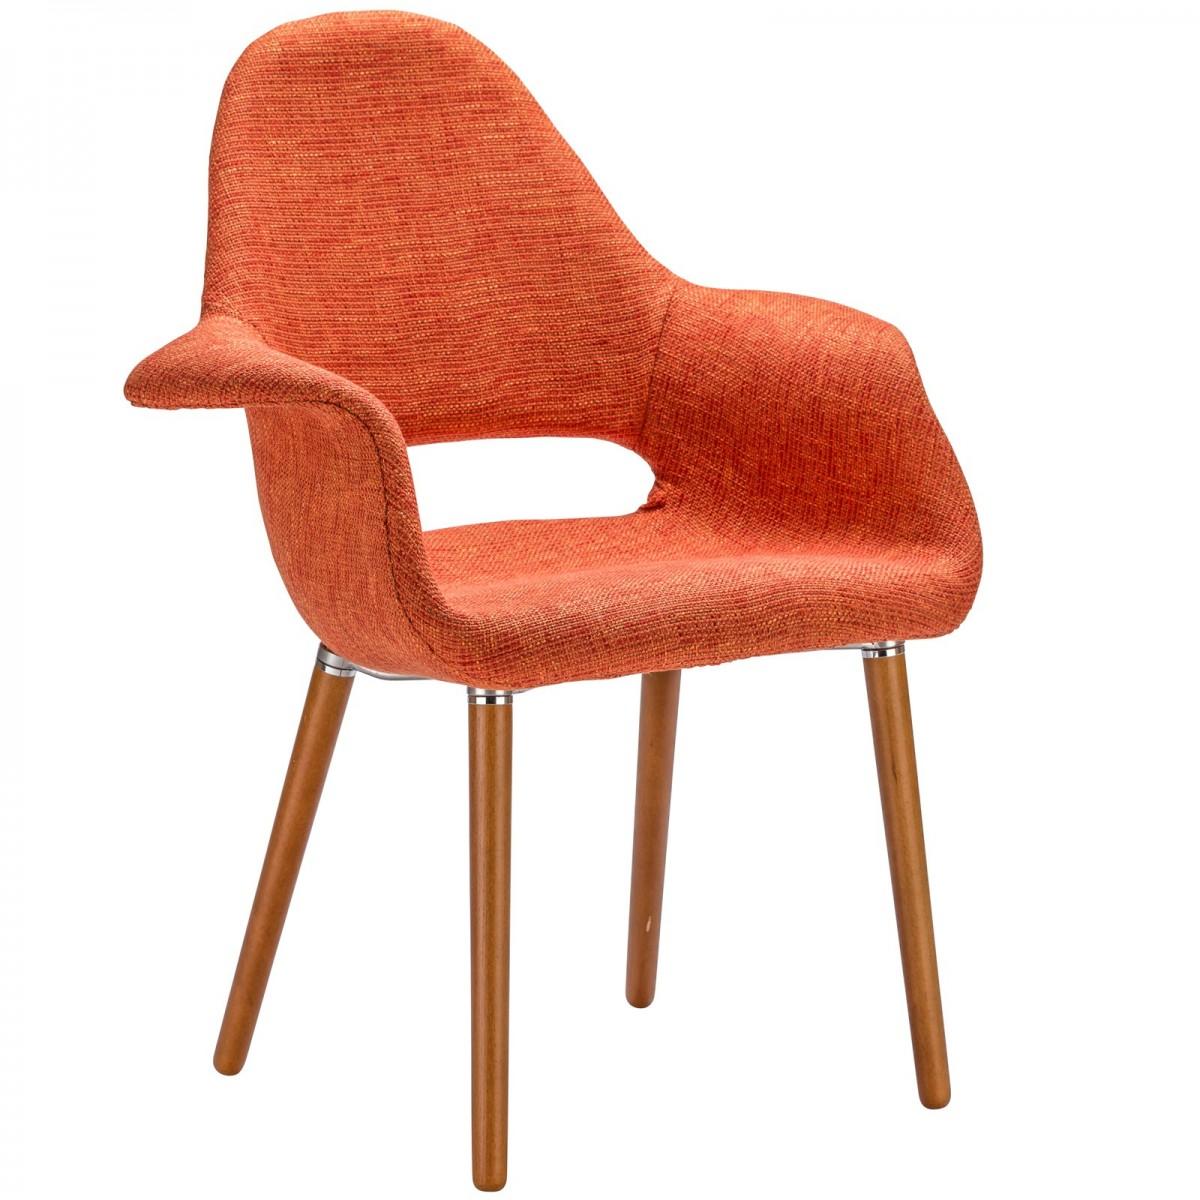 Eames amp Saarinen Style Orange Organic Designer Armchair  : eames organic chair orange1 from www.emoderndecor.com size 1200 x 1200 jpeg 204kB